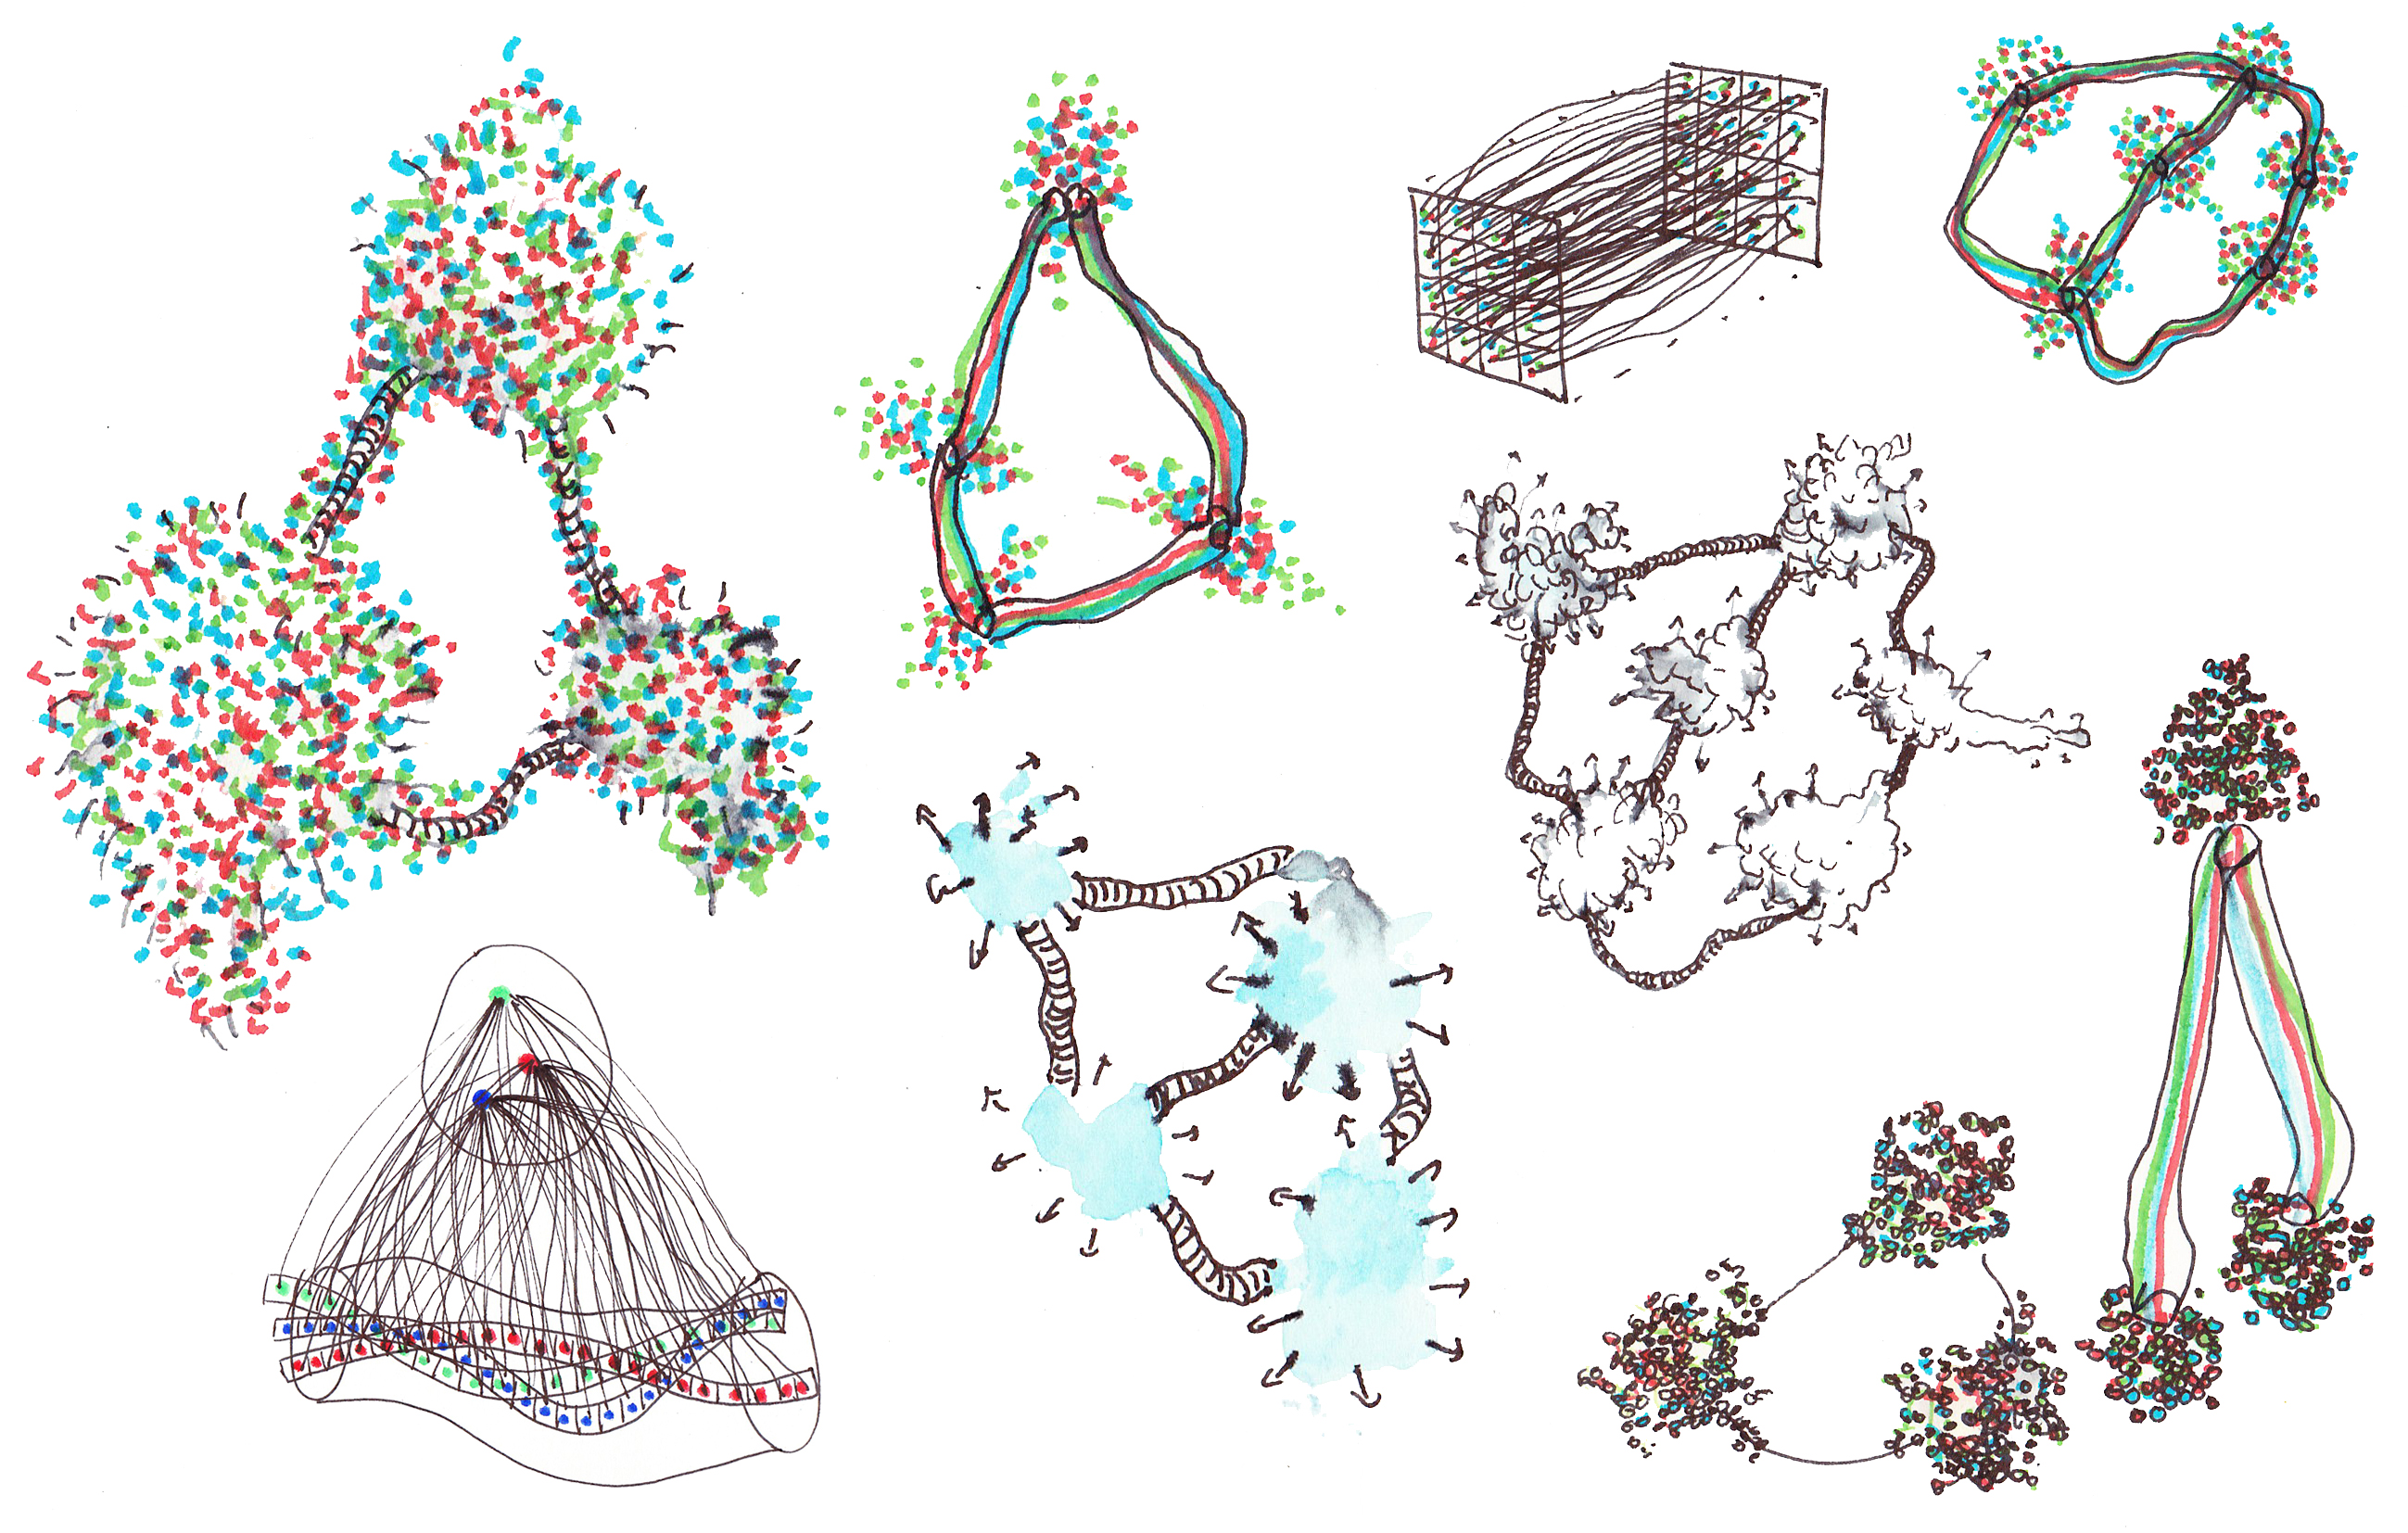 montage-illustration-mg-2